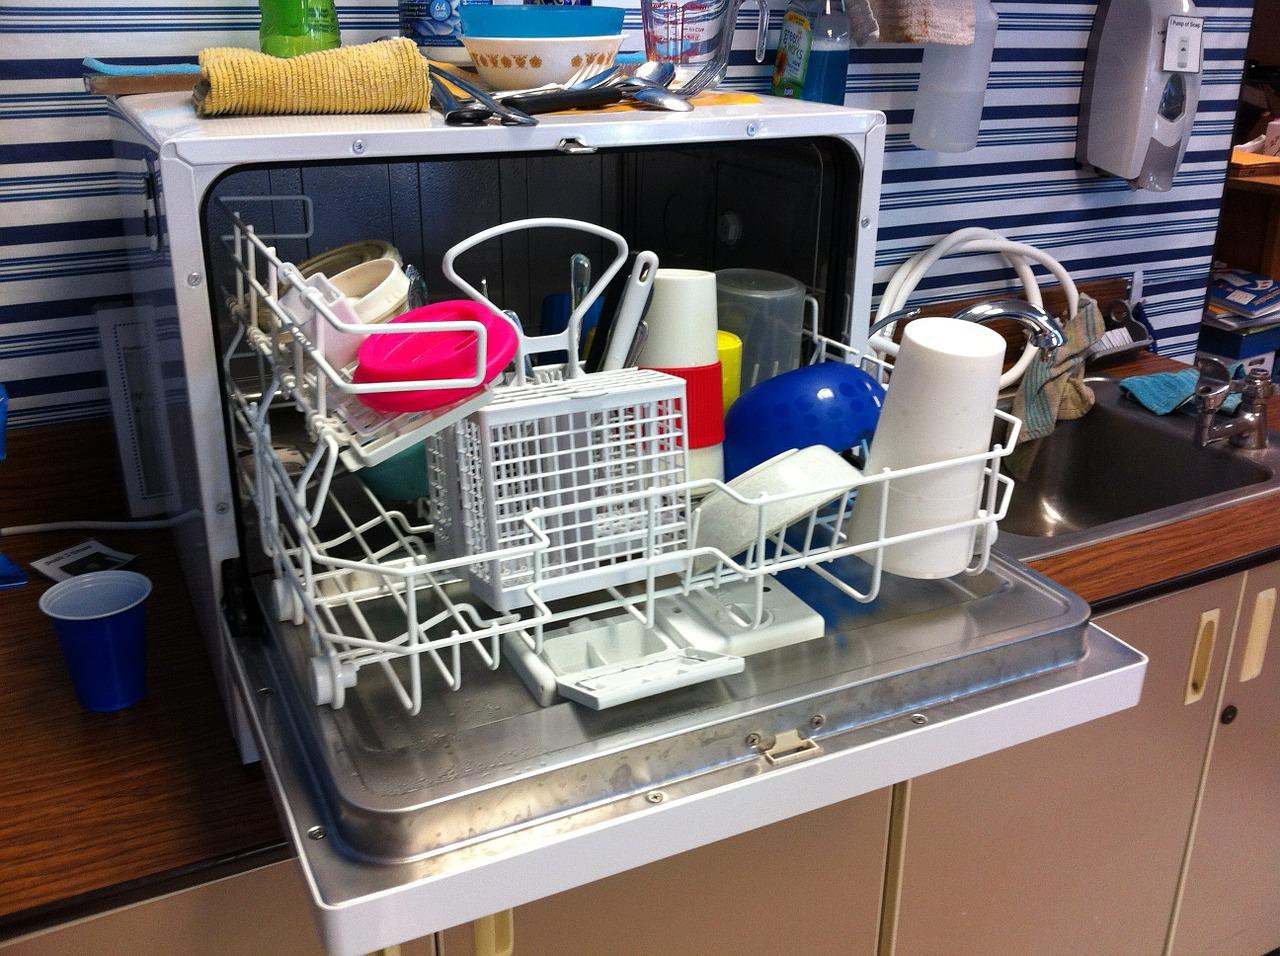 masina de spalat vase - sfatulparintilor.ro - pixabay_com